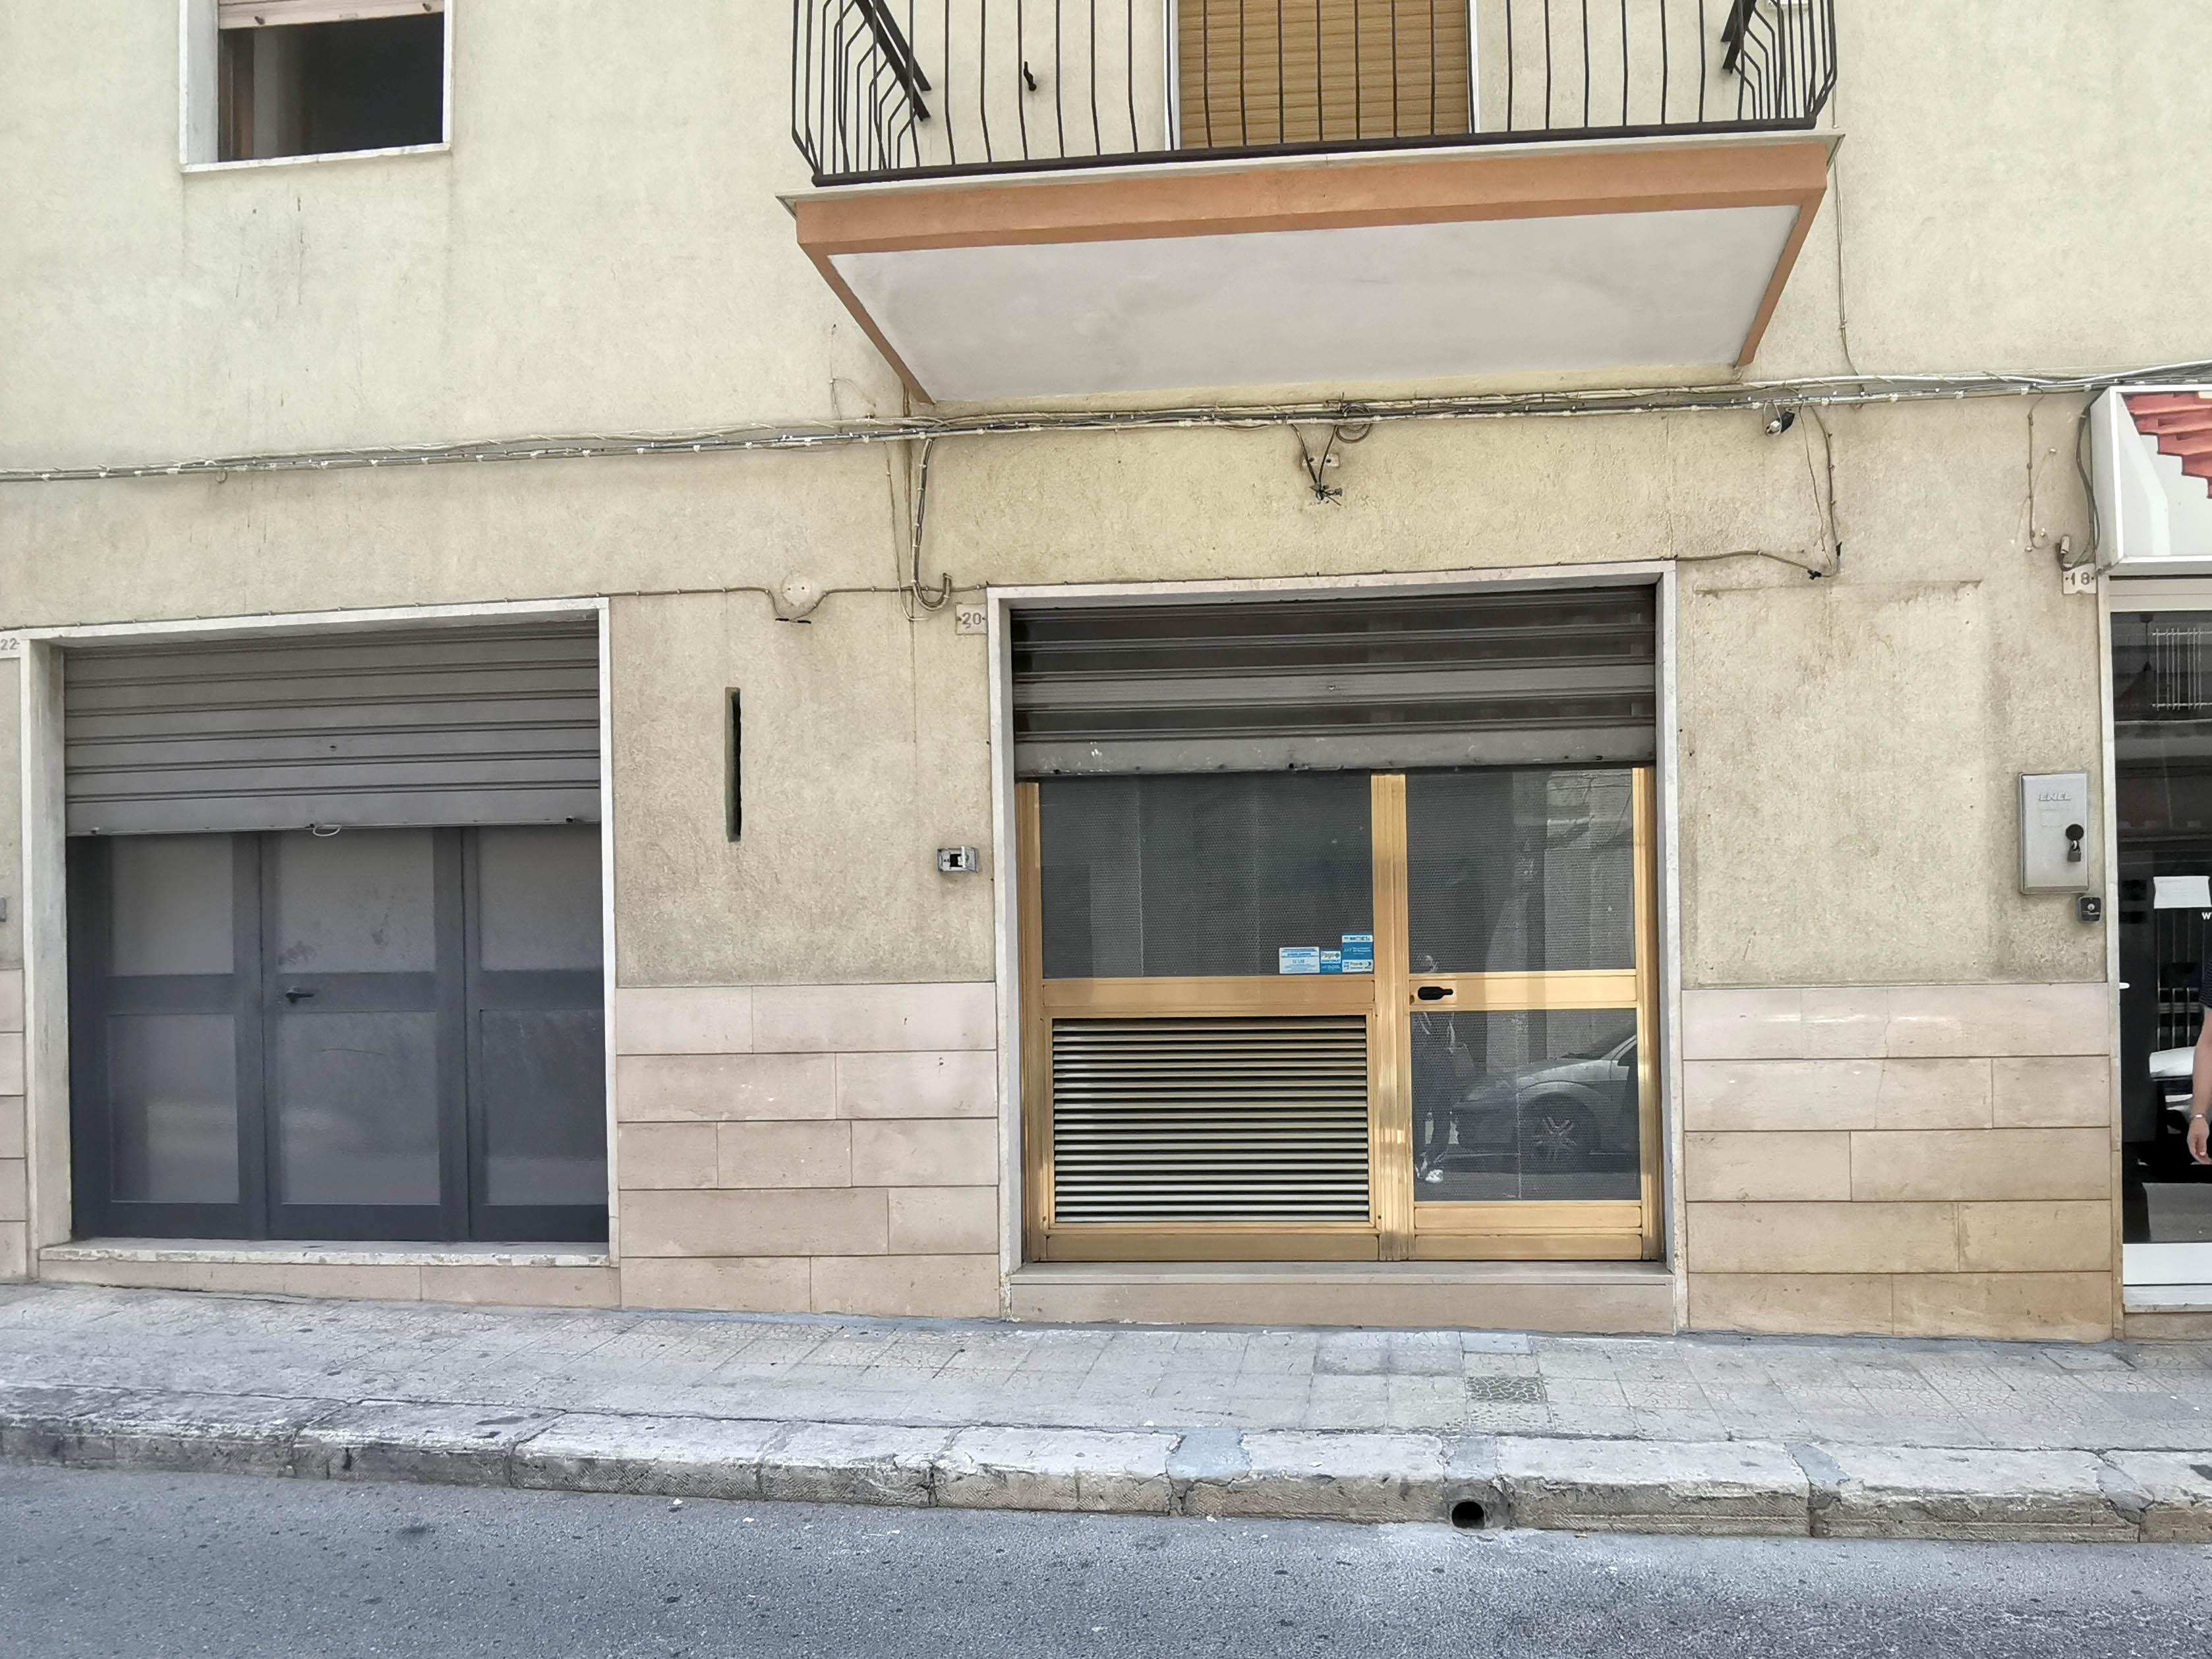 004 – Locale Commerciale – Via Cesare Pavese – Martina Franca